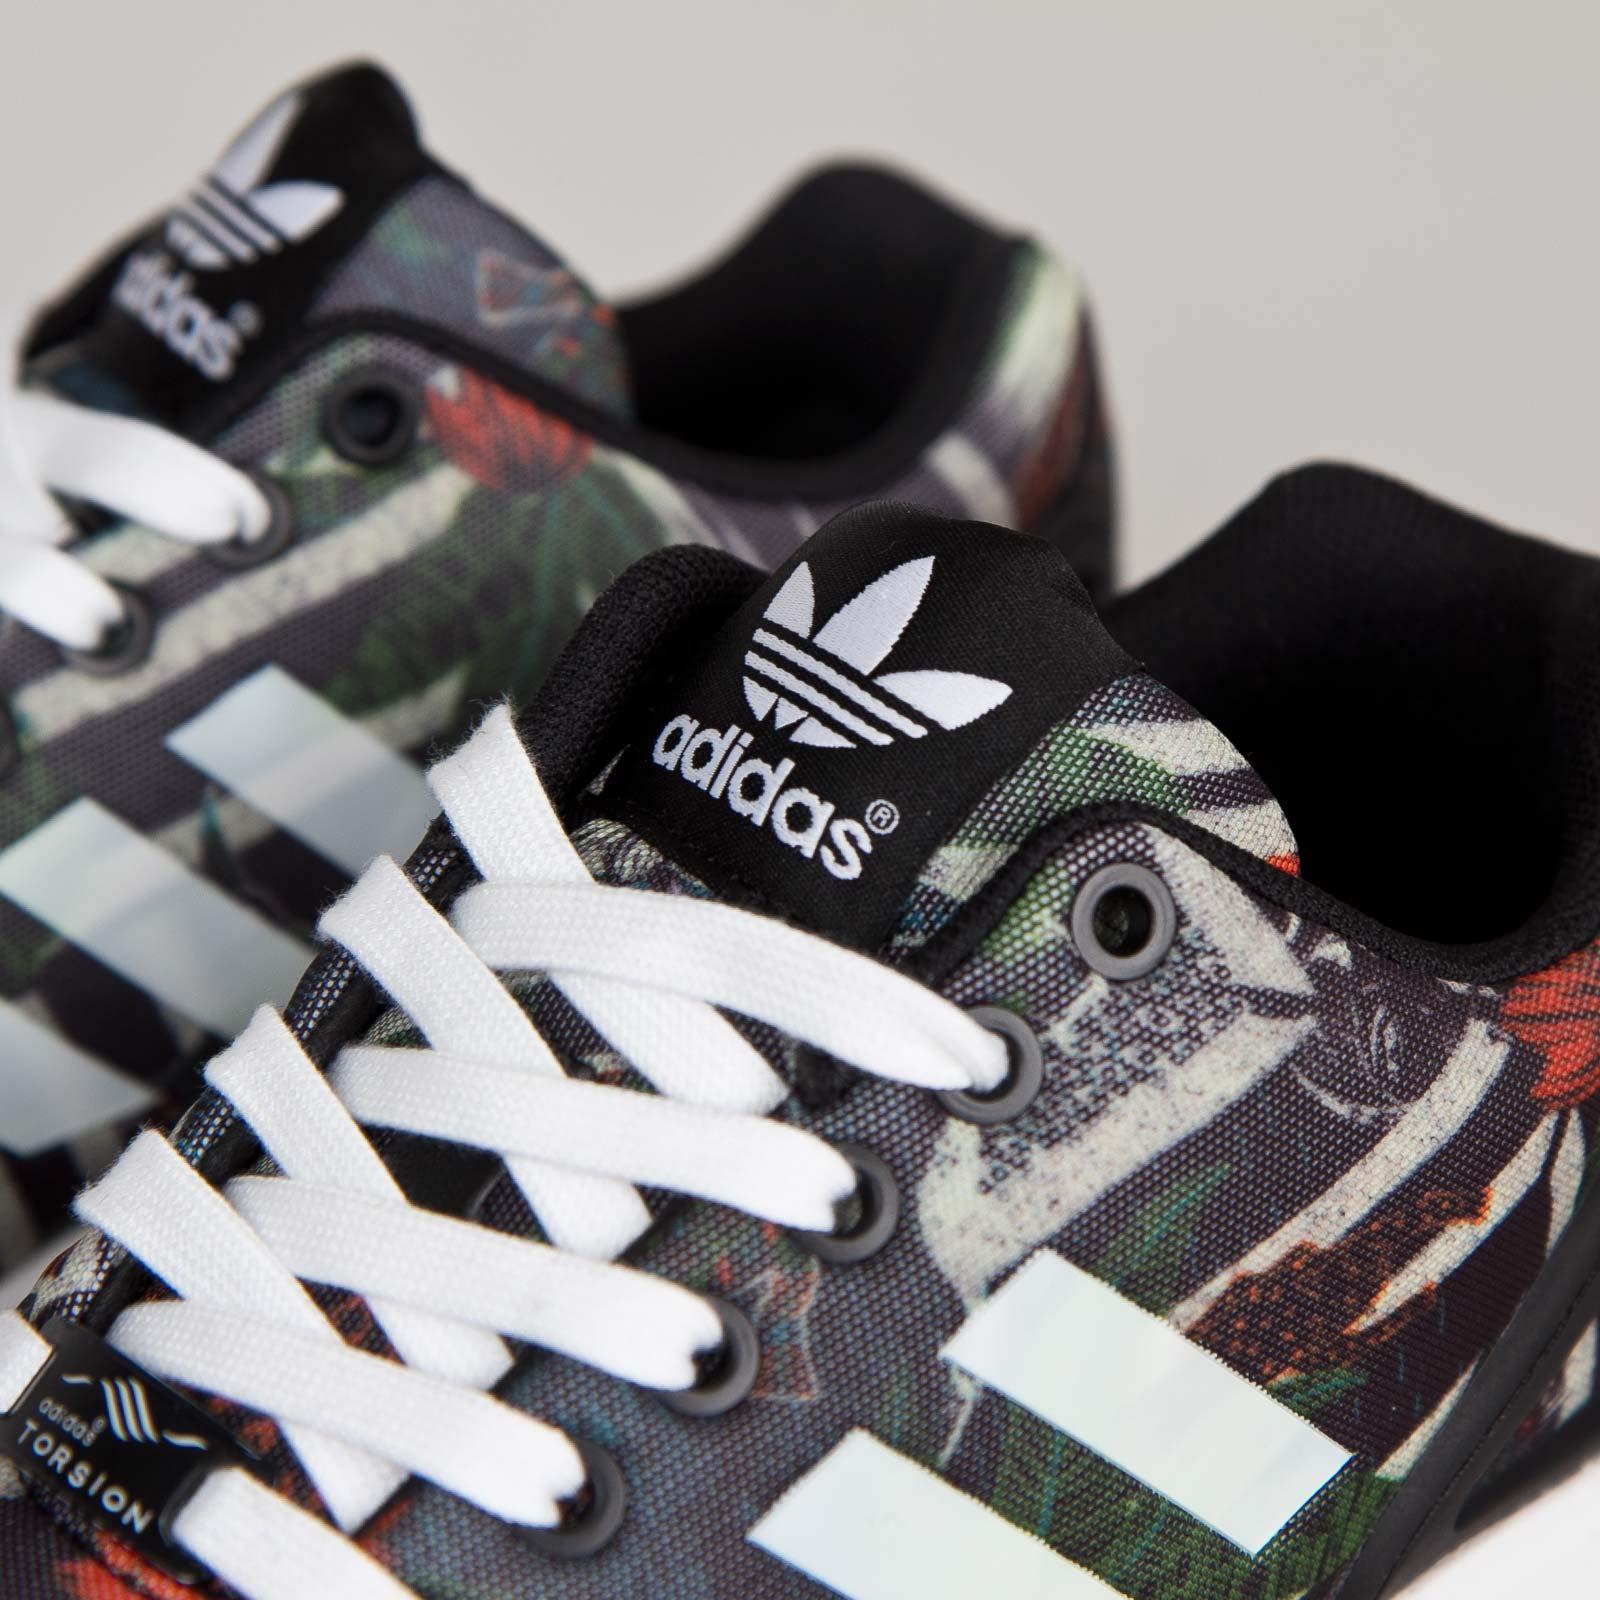 81a0edfb80ff9 adidas ZX Flux Sneakersnstuff W B25484 B25484 Sneakersnstuff ZX | fce2b22 -  niajt.pw